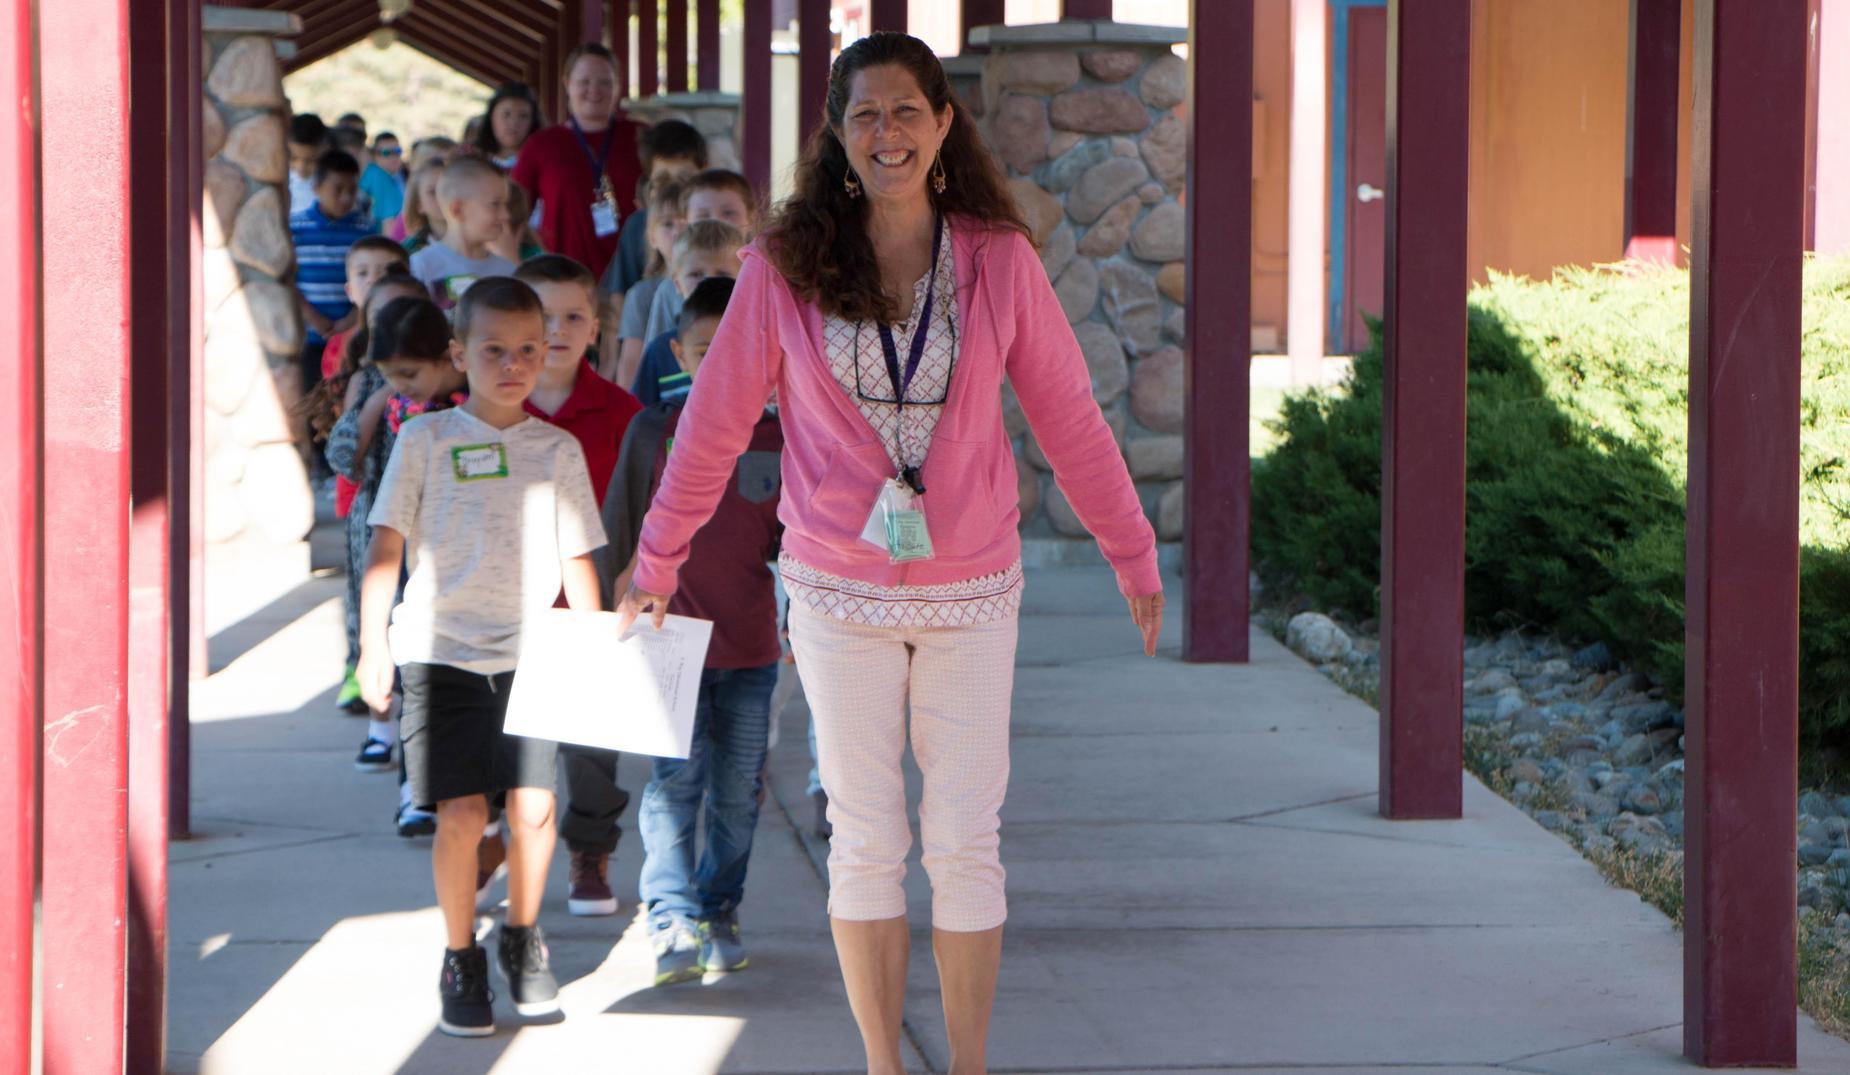 Teacher leading students down the hallway